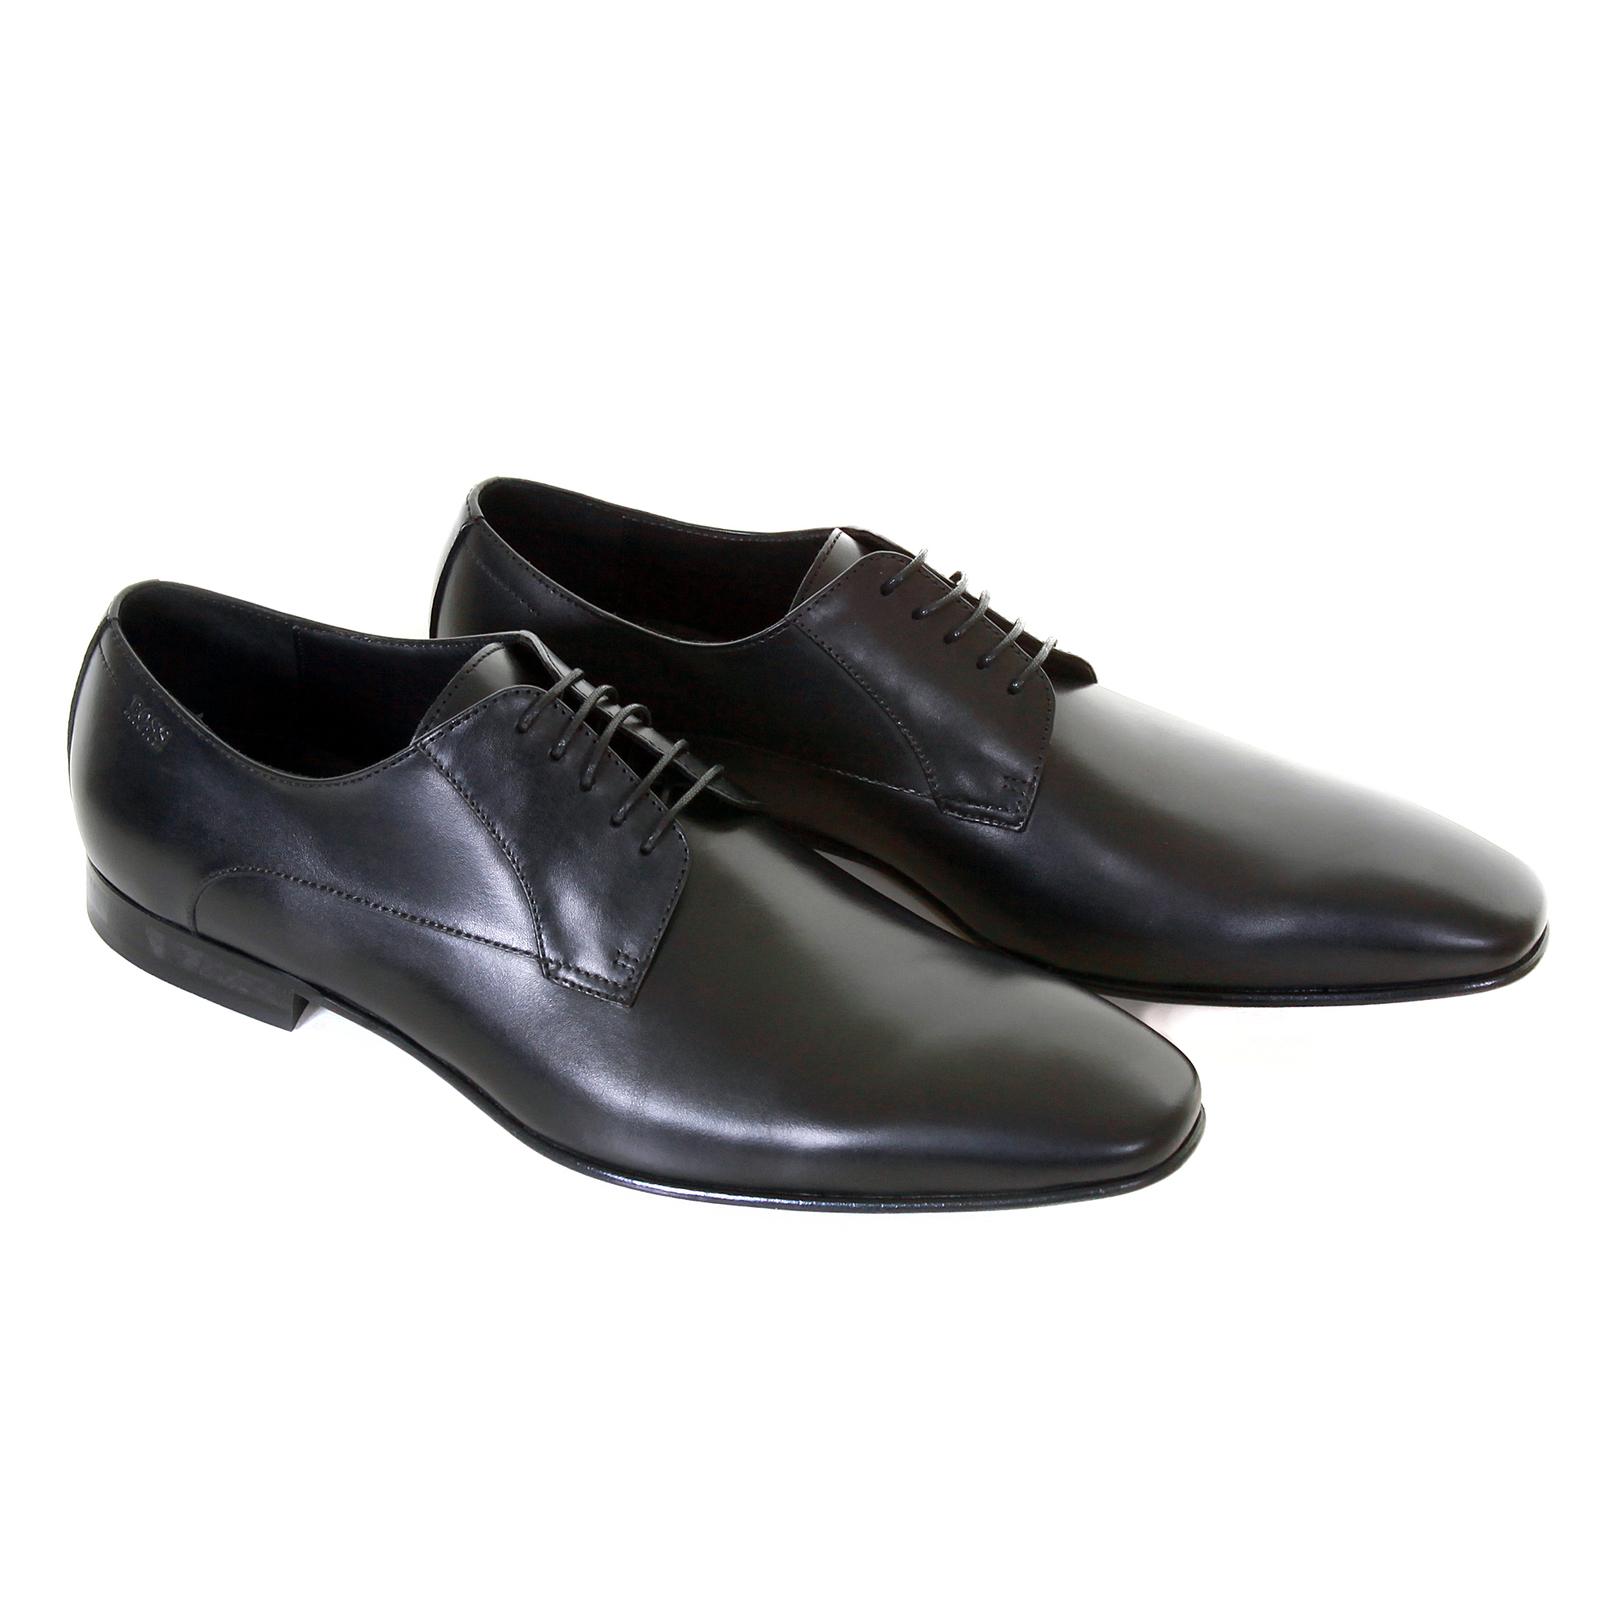 Hugo Boss Shoes Canada Men